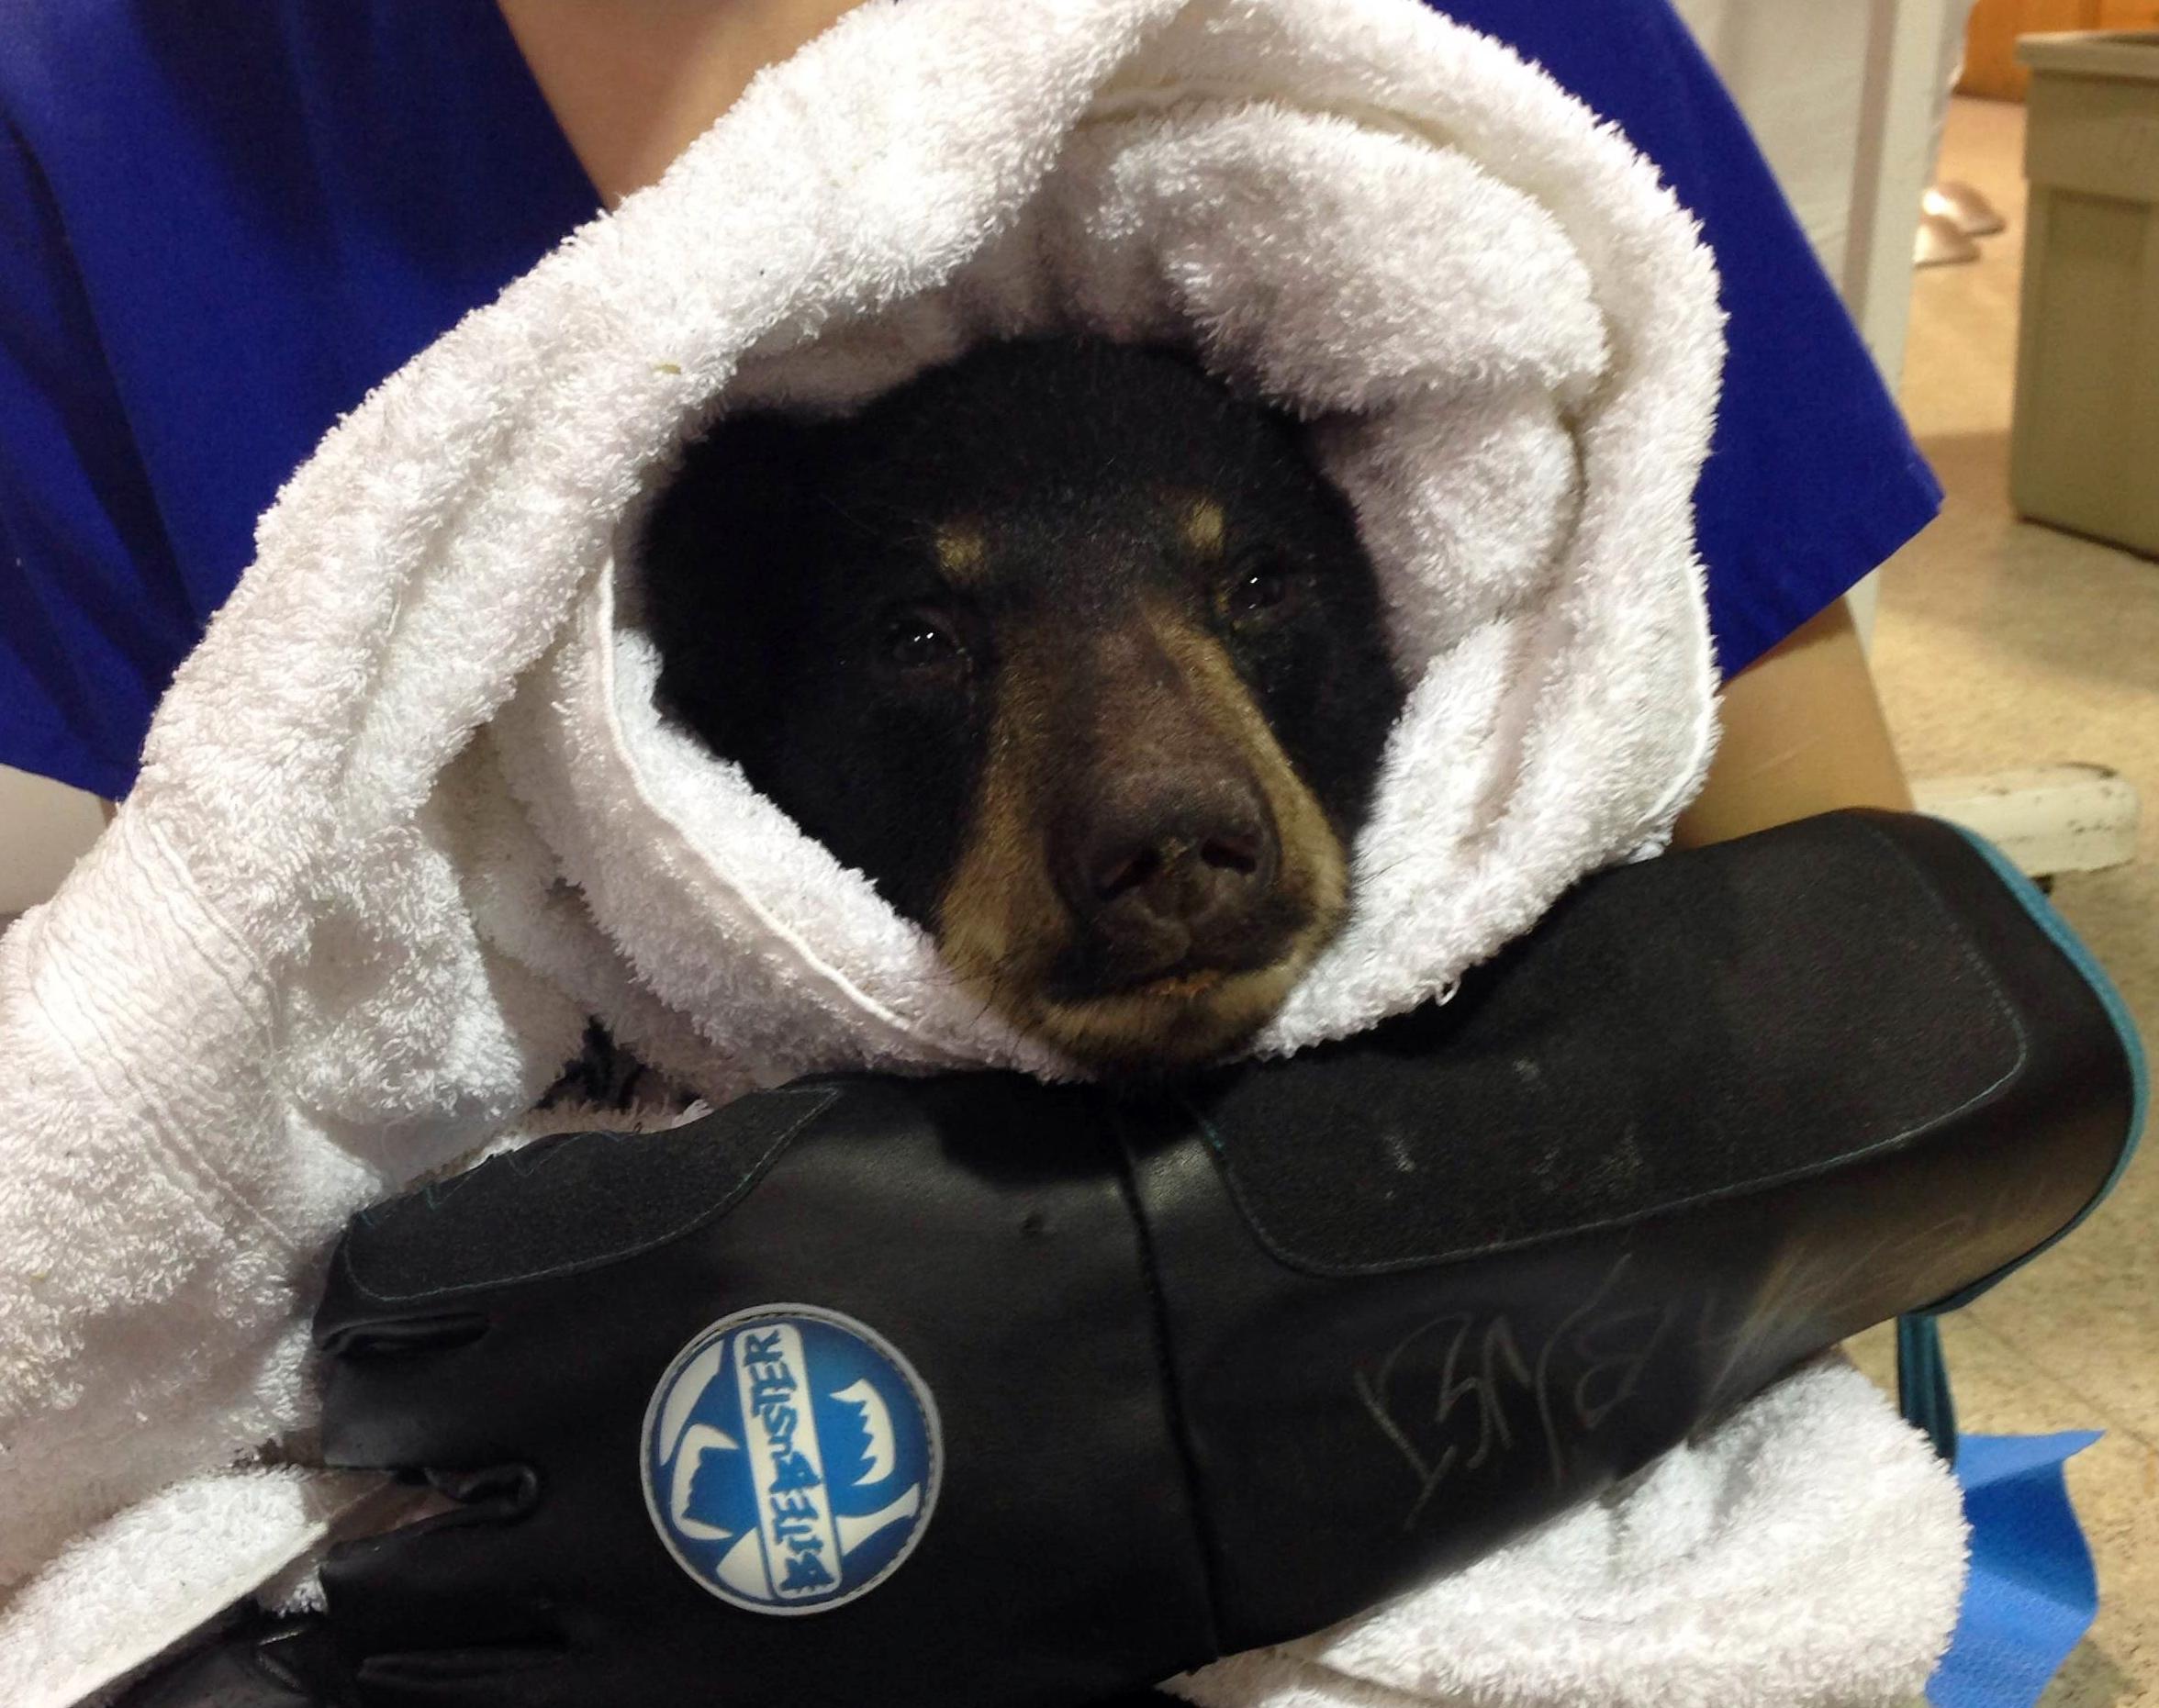 Bear cub dating